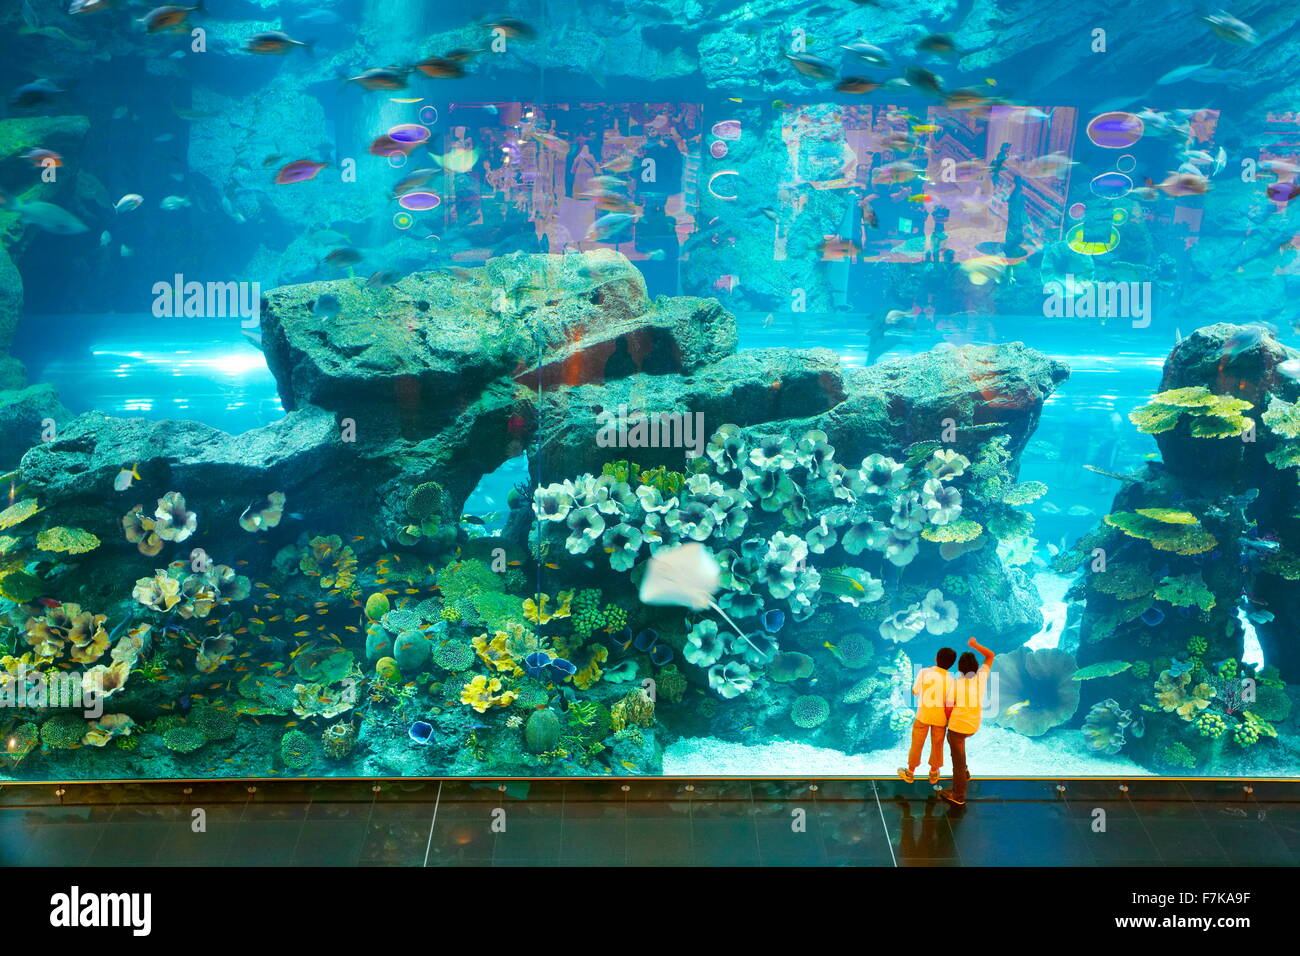 Niños mirando el mundo submarino en el acuario Dubai Mall, Dubai, Emiratos Árabes Unidos. Foto de stock